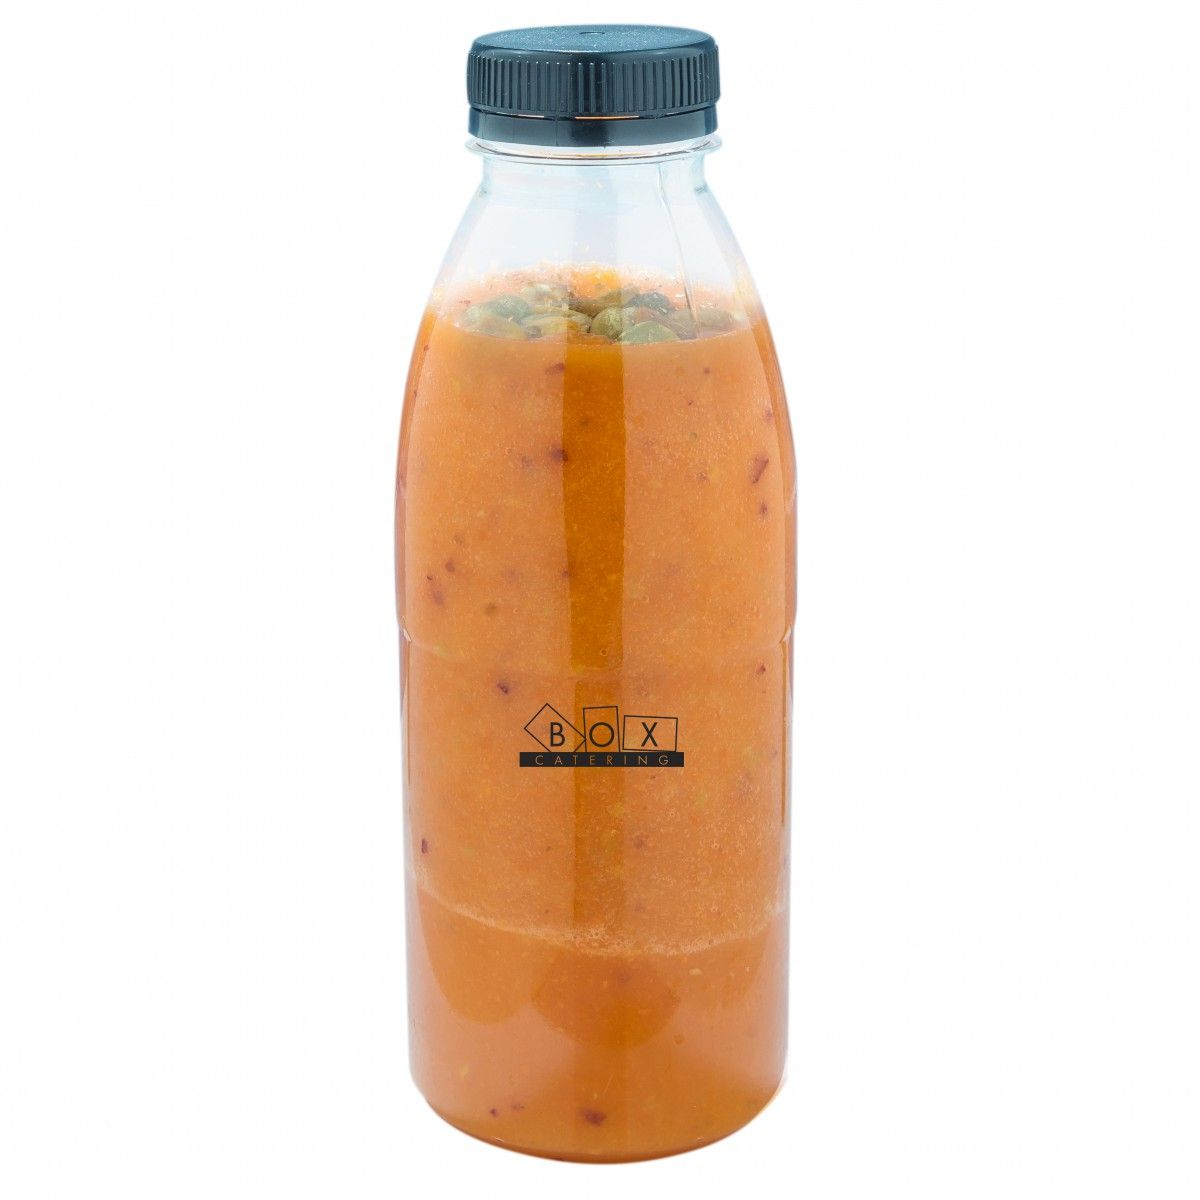 Смузи яблочно-морковный фото 1